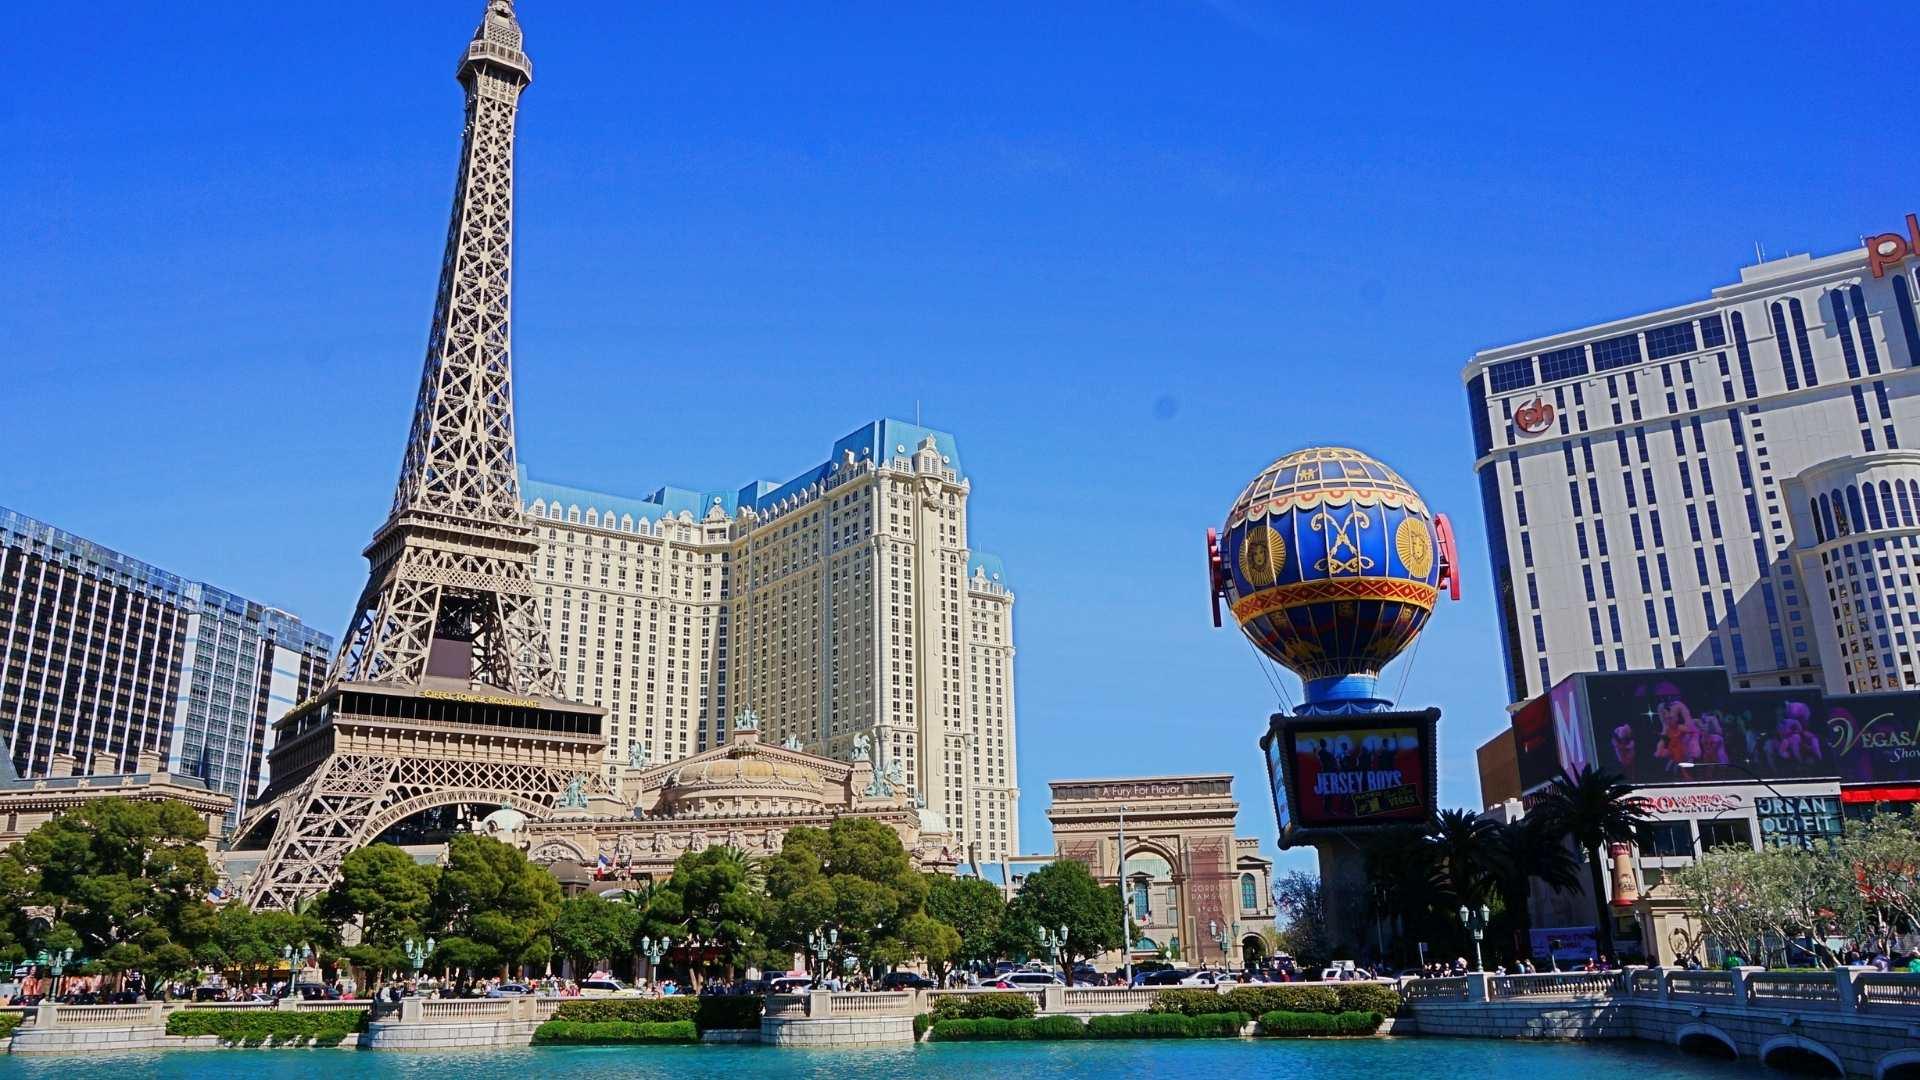 Las Vegas road trip with friends